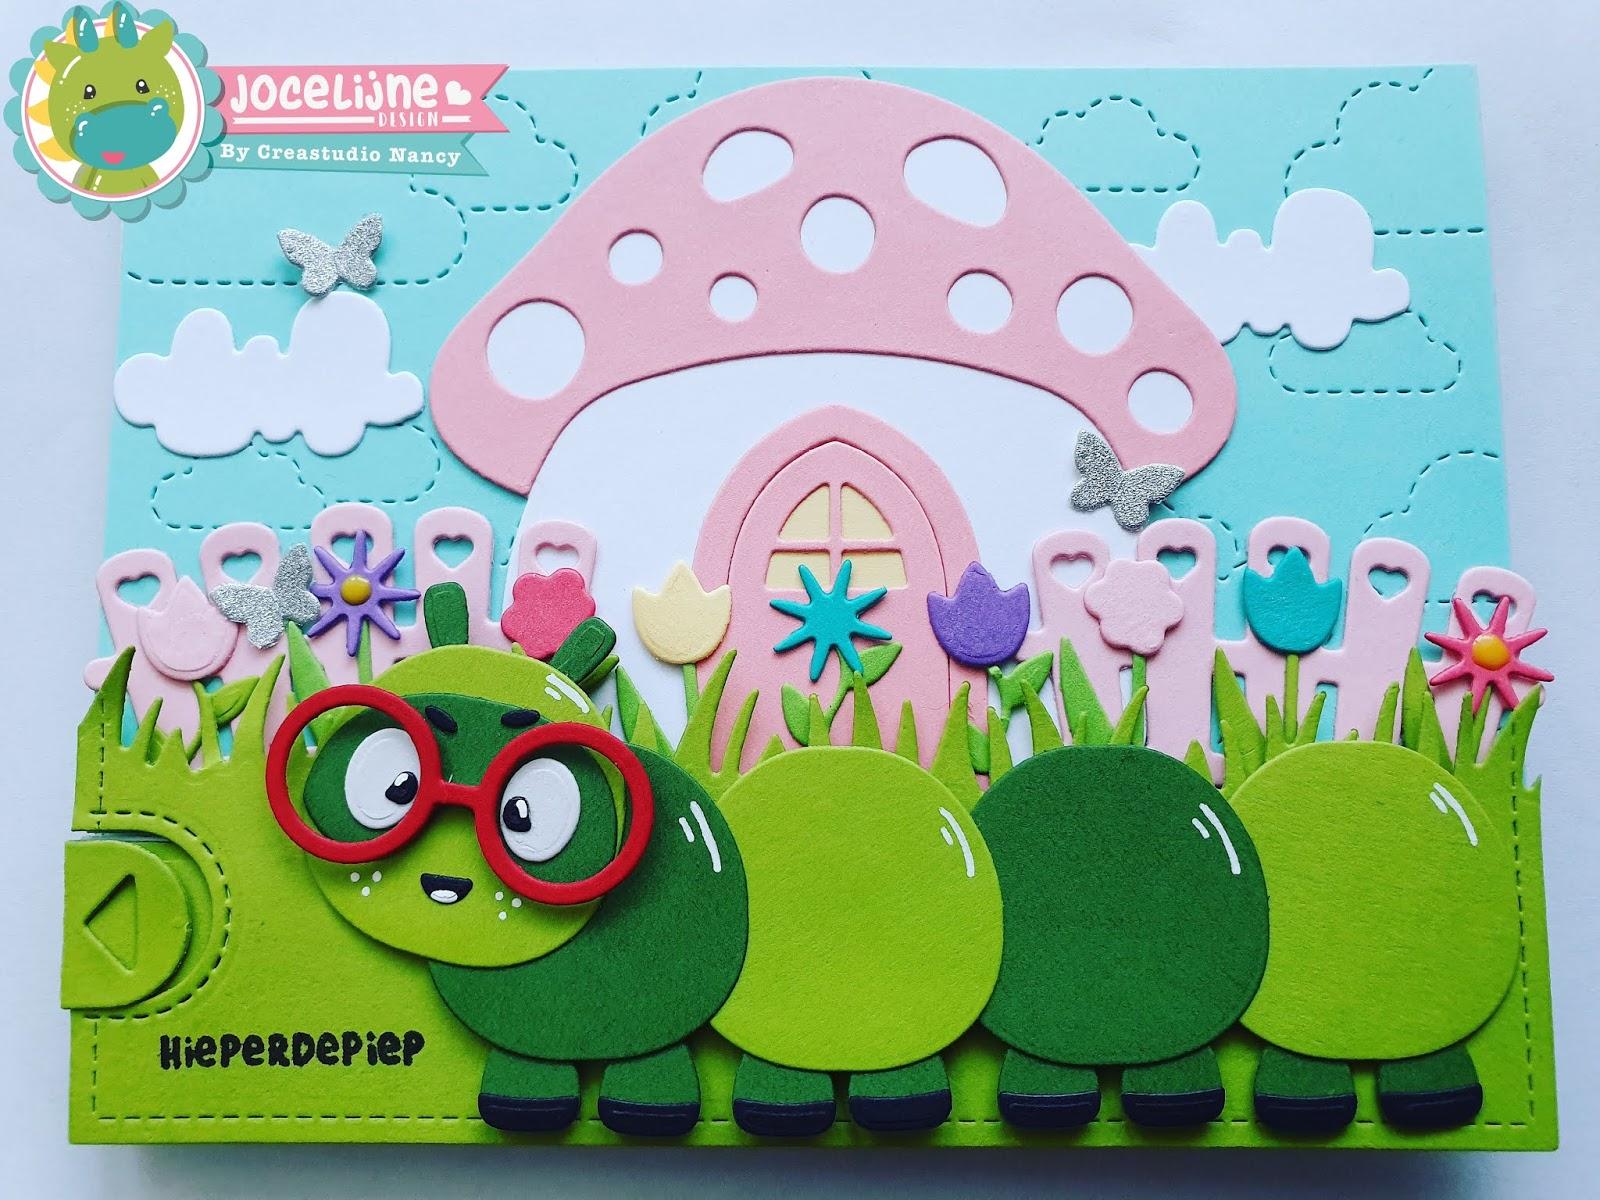 Tumble Friends & Mushroomhouse